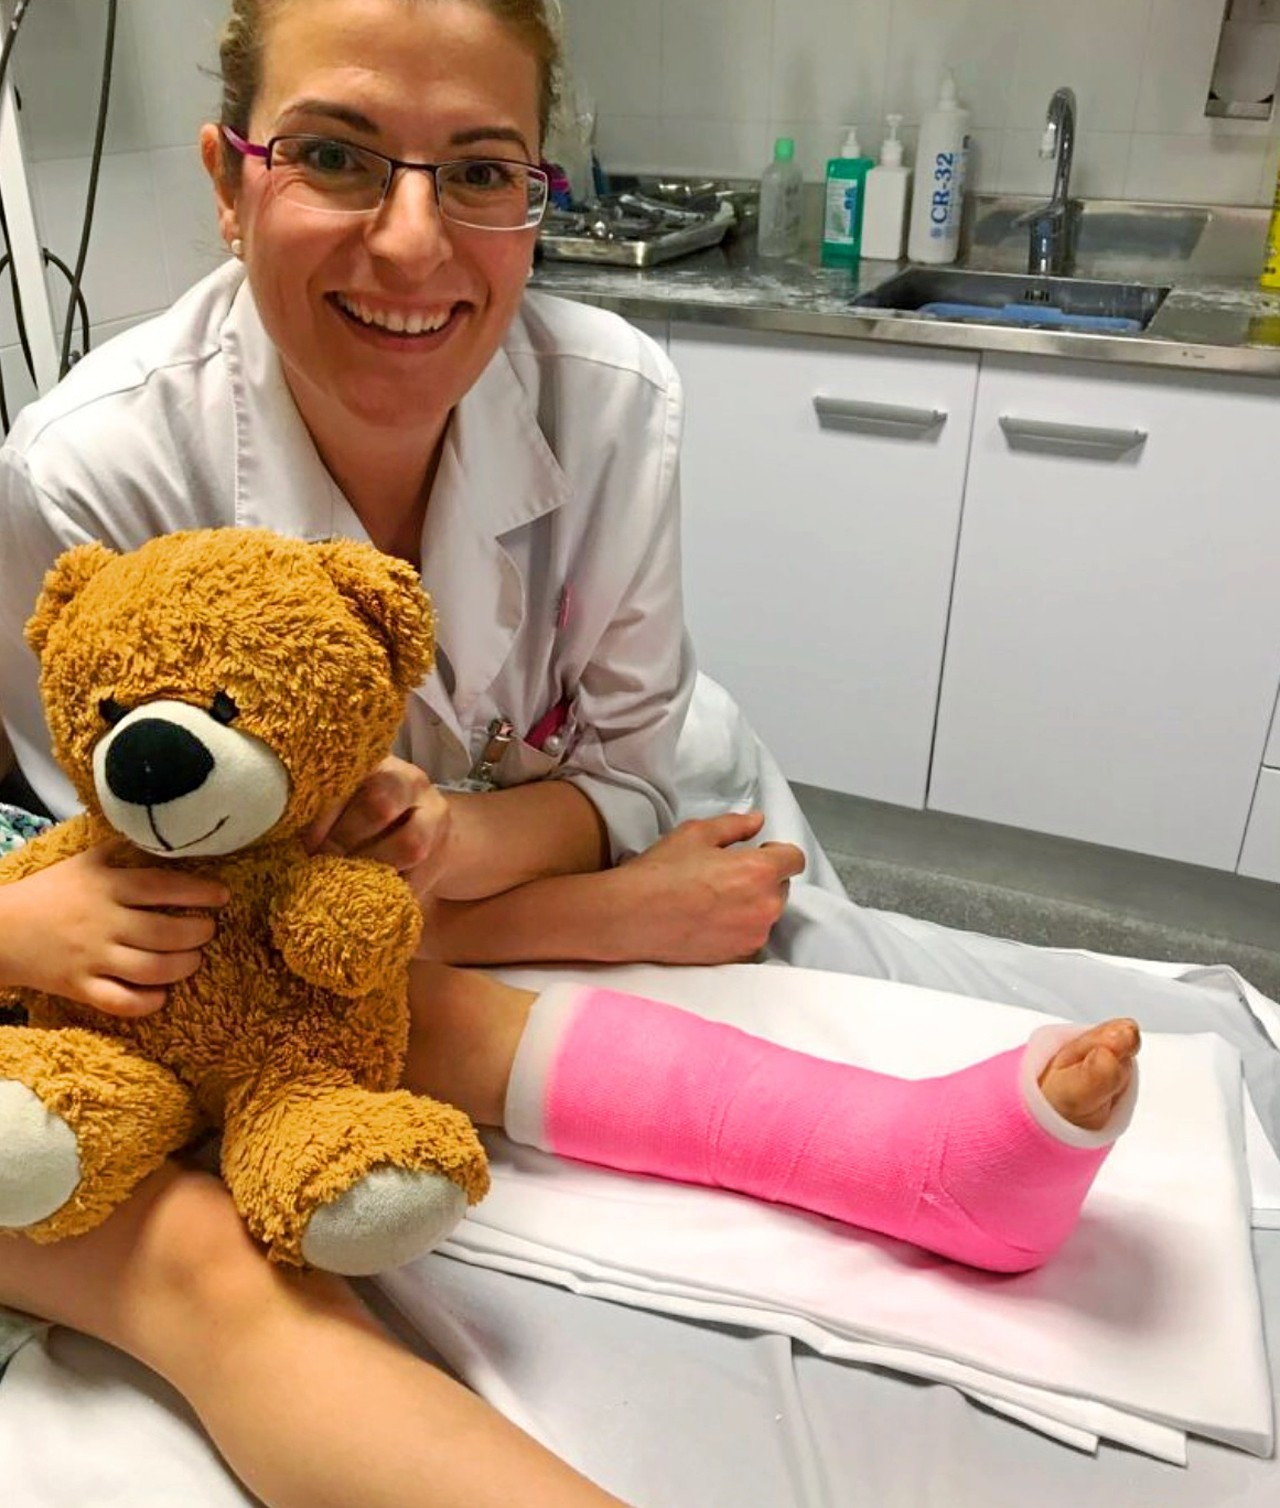 Eugènia Miranda, traumatóloga del Hospital de San Pablo y Santa Tecla en Tarragona.